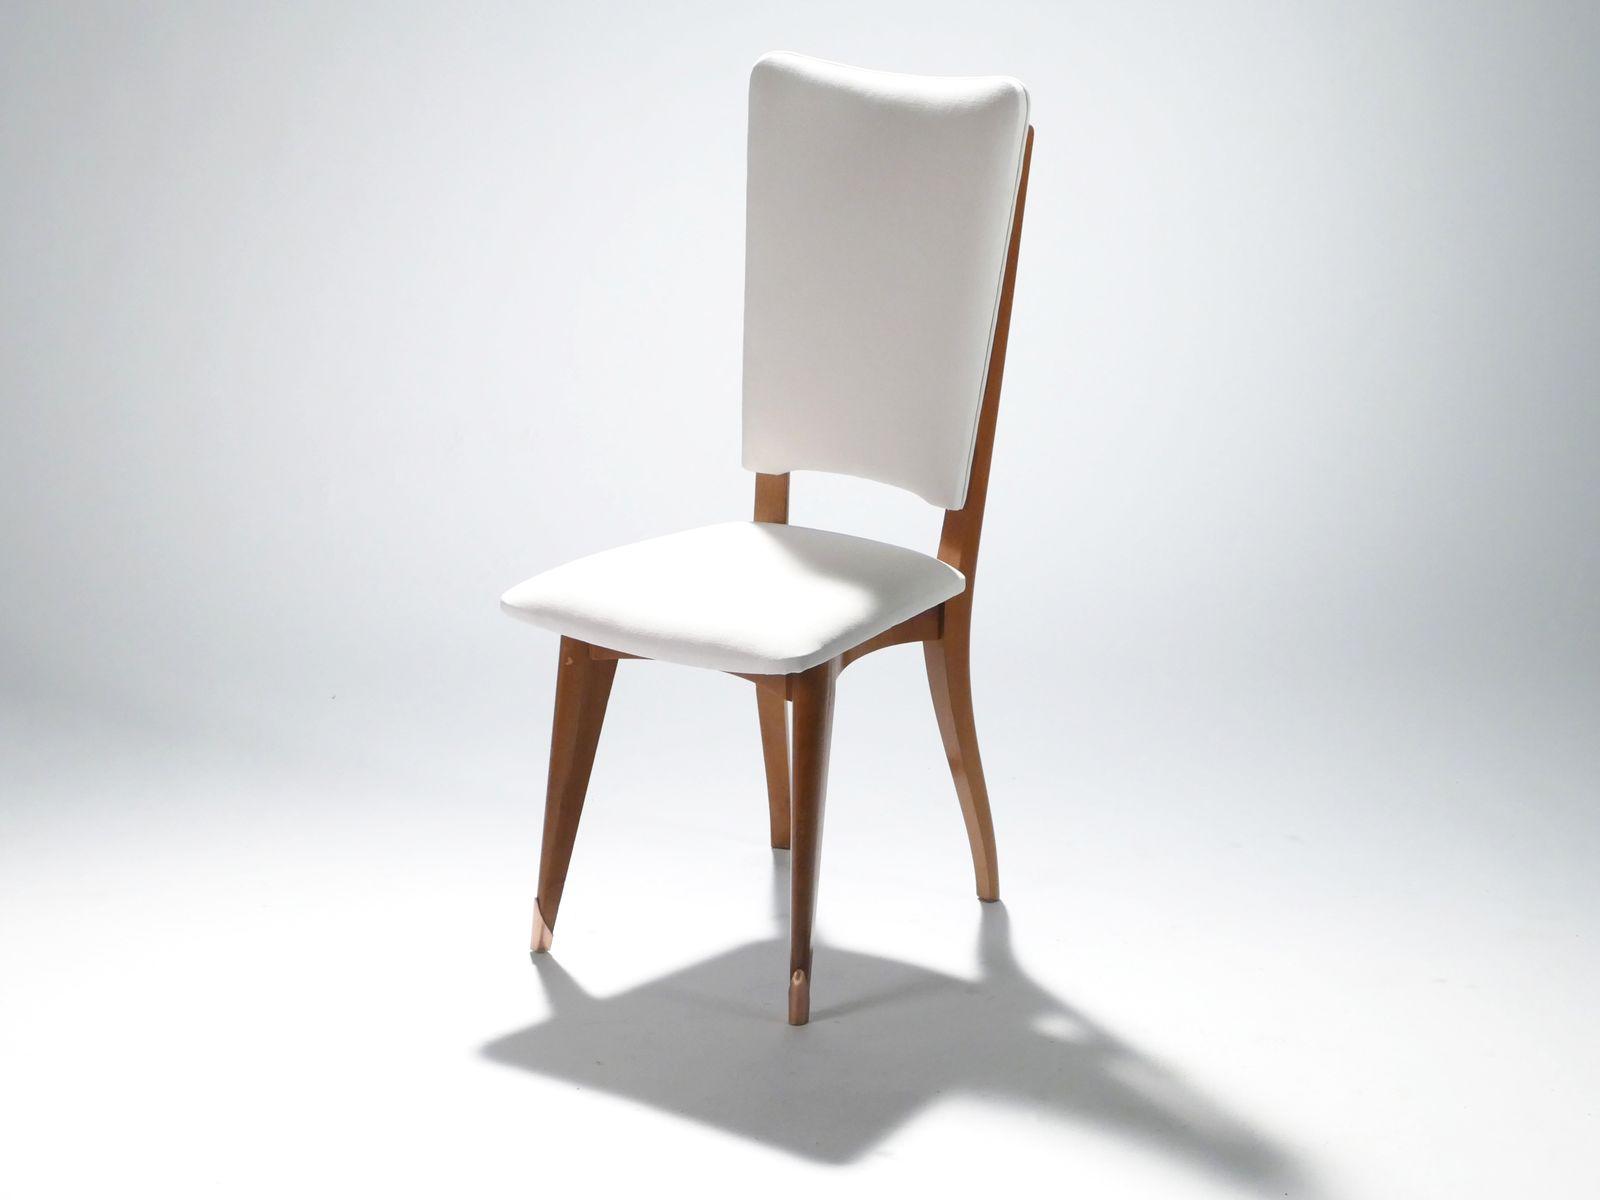 skandinavische teak st hle 1960er 8er set bei pamono kaufen. Black Bedroom Furniture Sets. Home Design Ideas